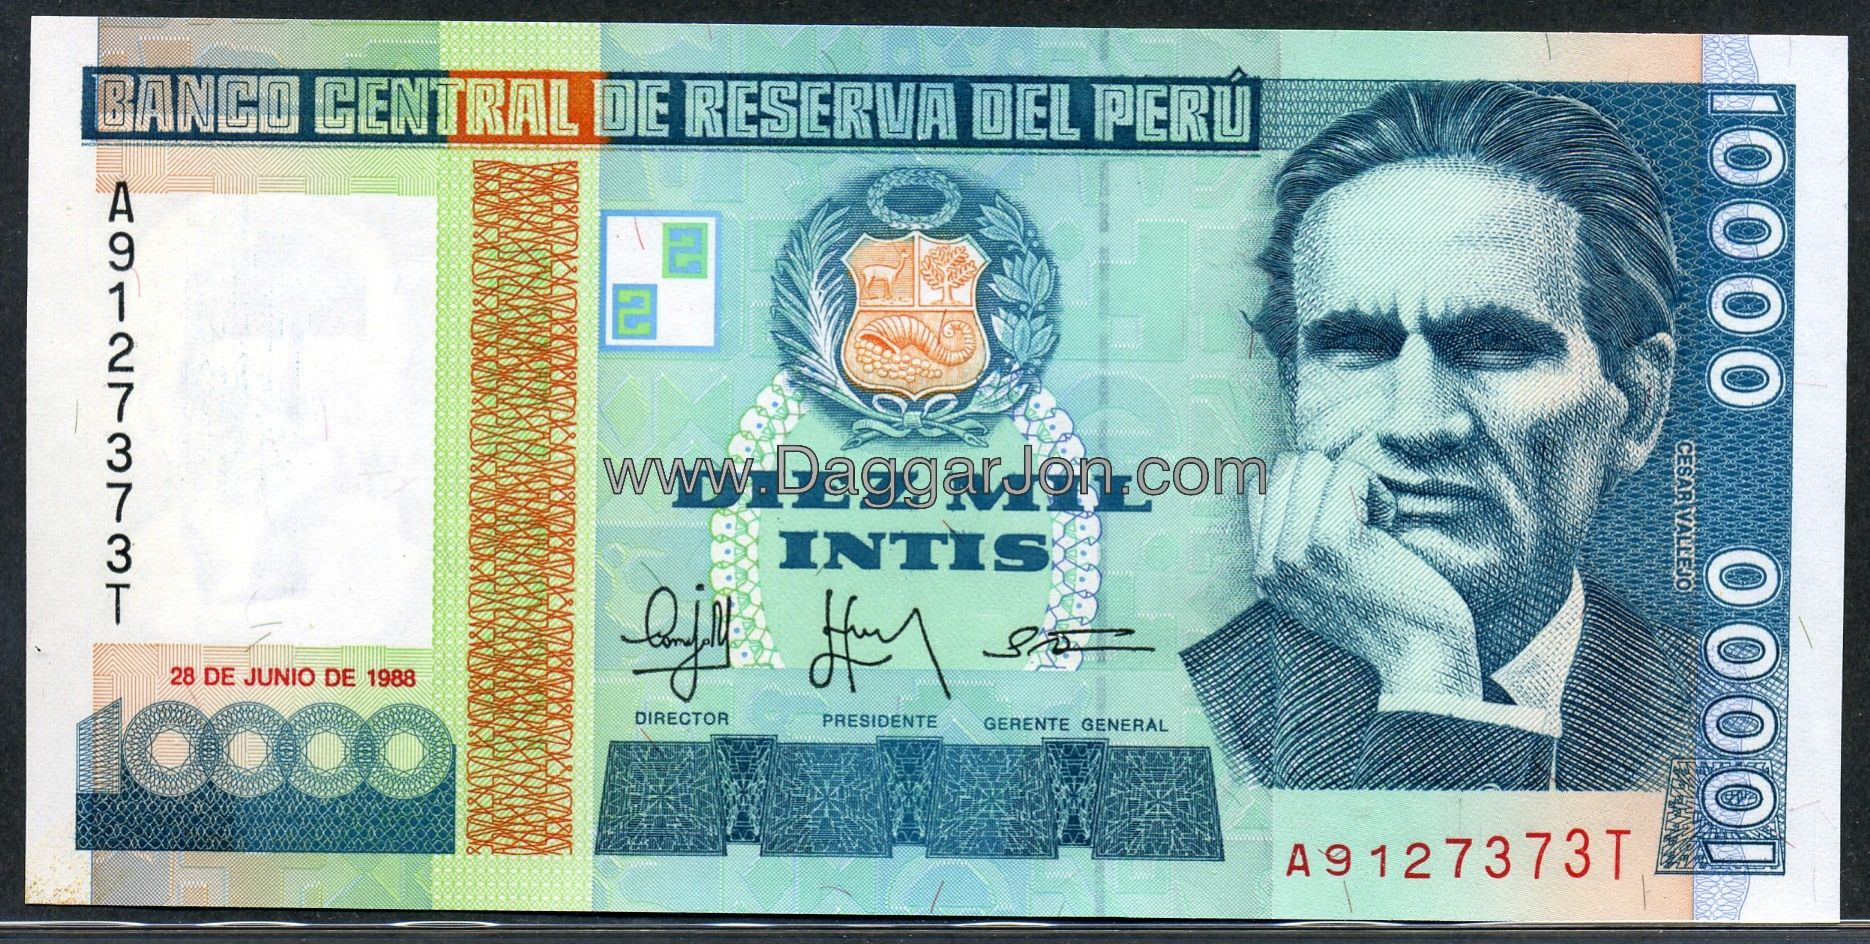 Peru money peru 10000 intis 1988 obverse p 140 world currency peru money peru 10000 intis 1988 obverse p 140 thecheapjerseys Image collections